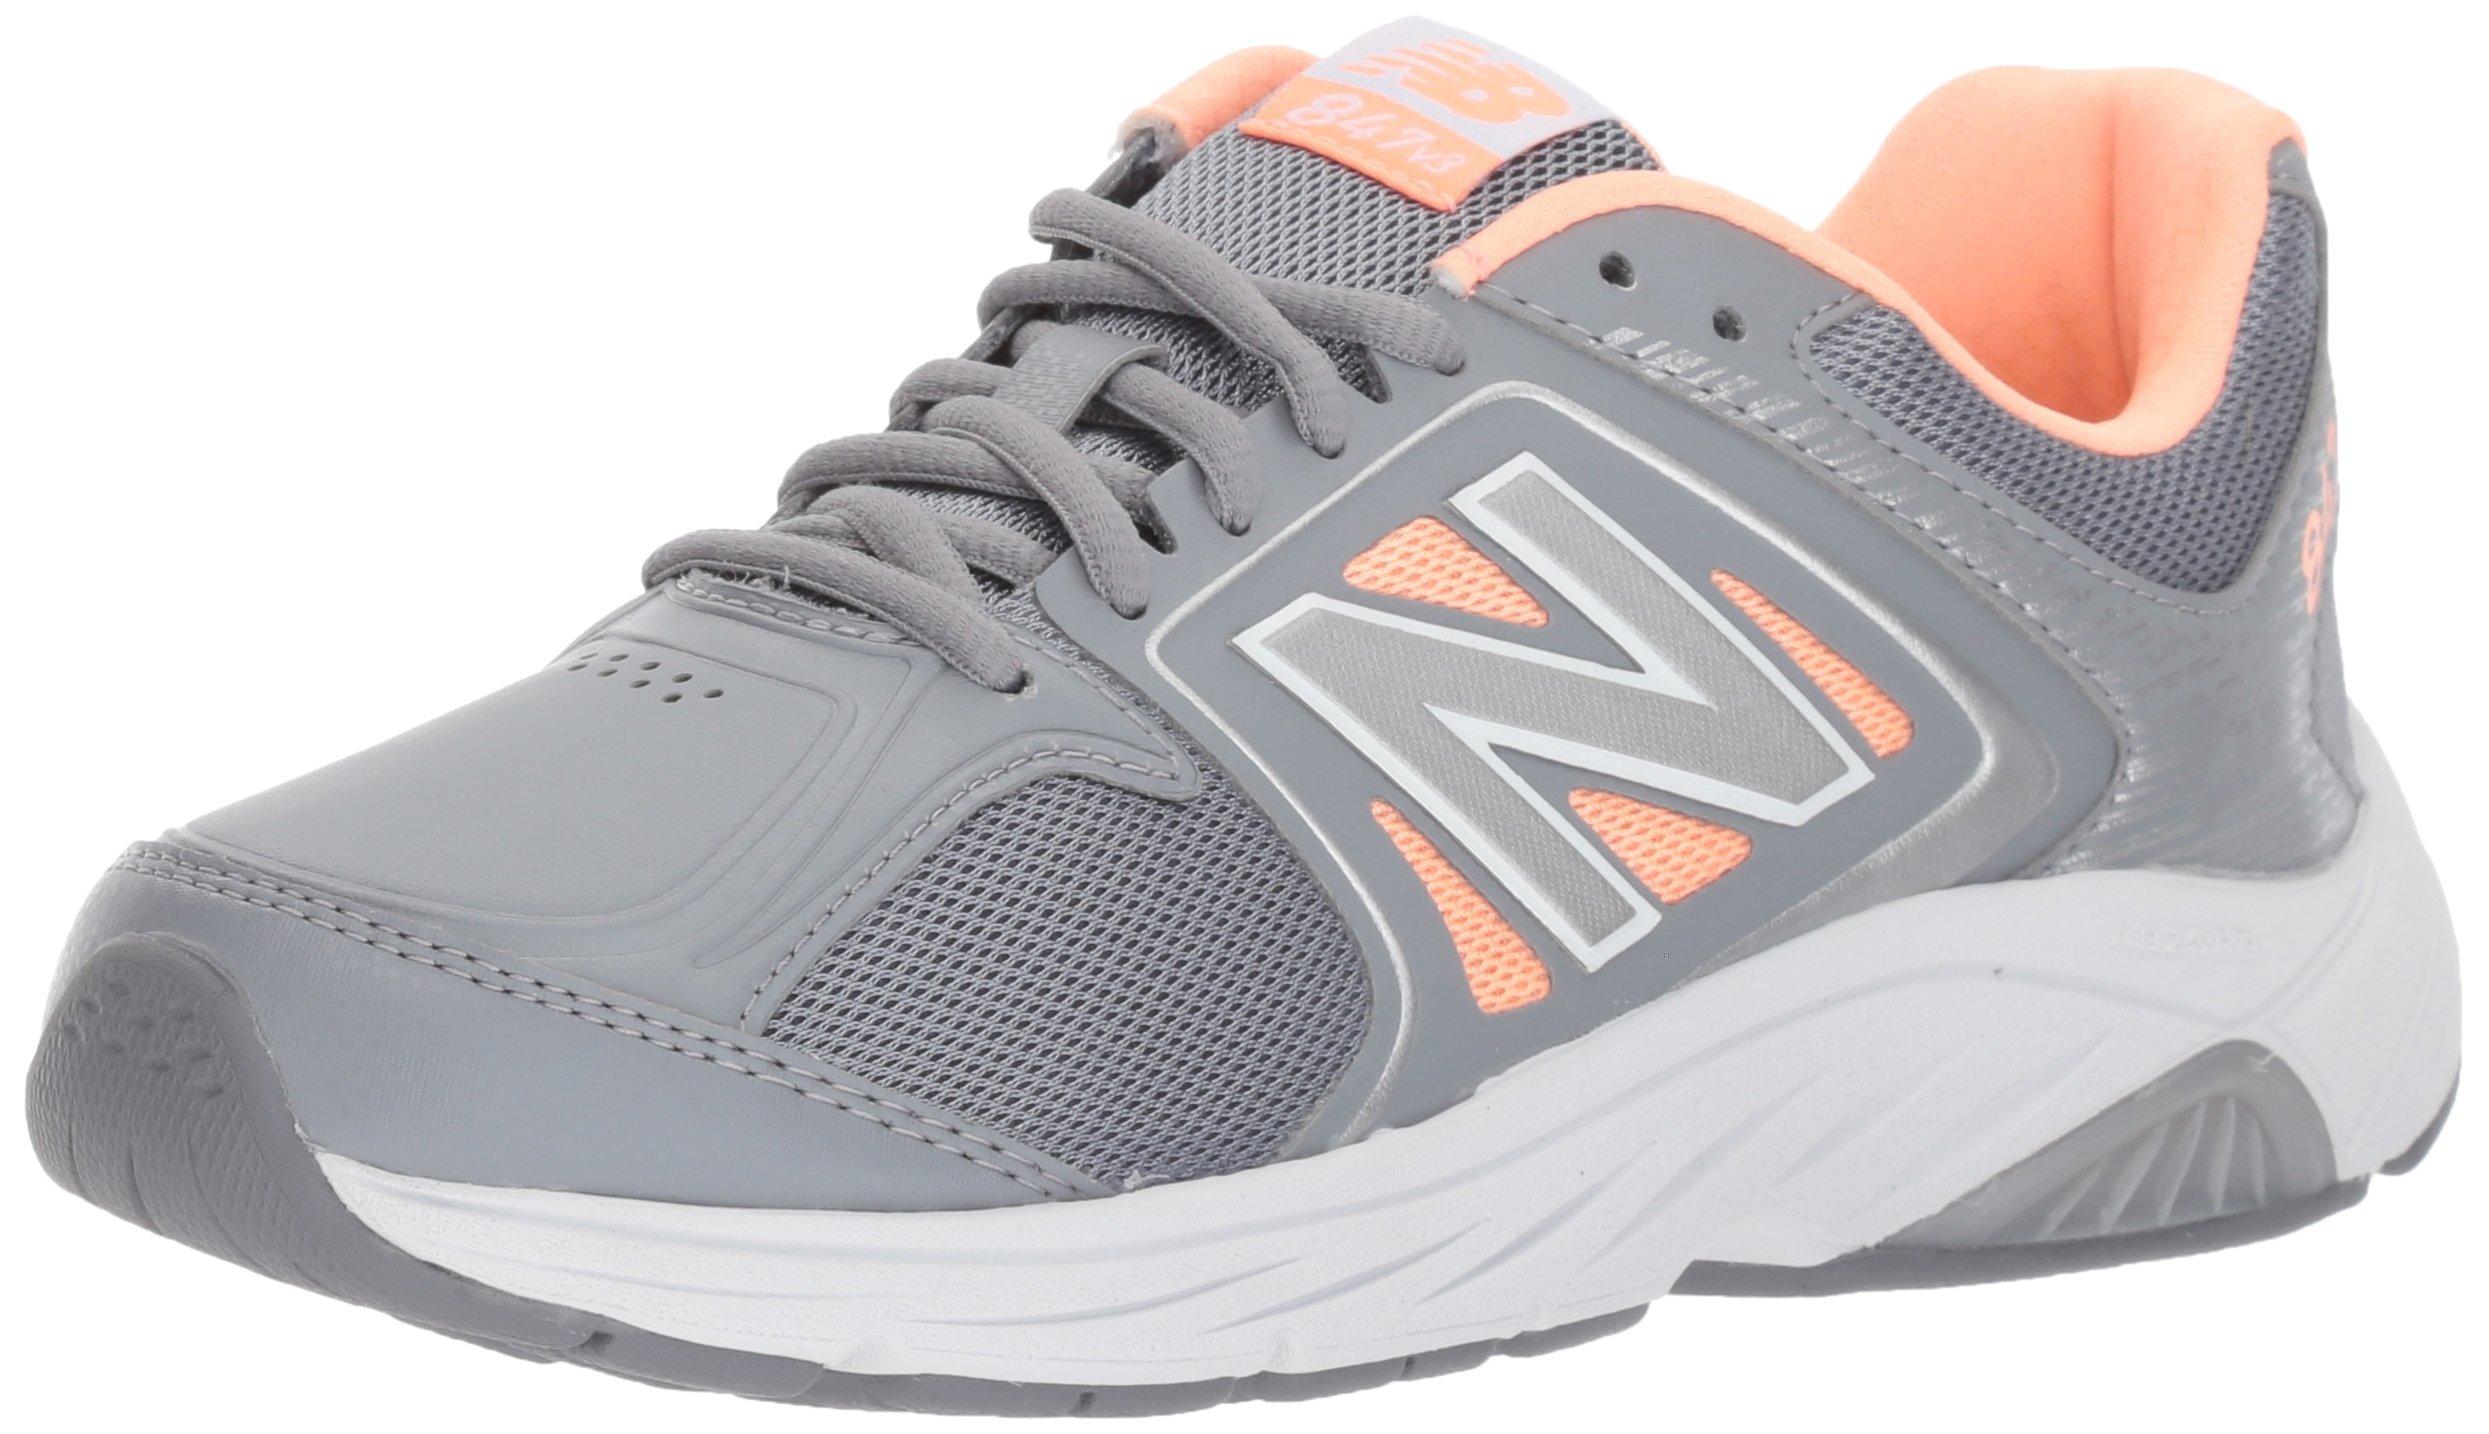 New Balance Women's 847V3 Walking Shoe, Grey/Pink, 10 2E US